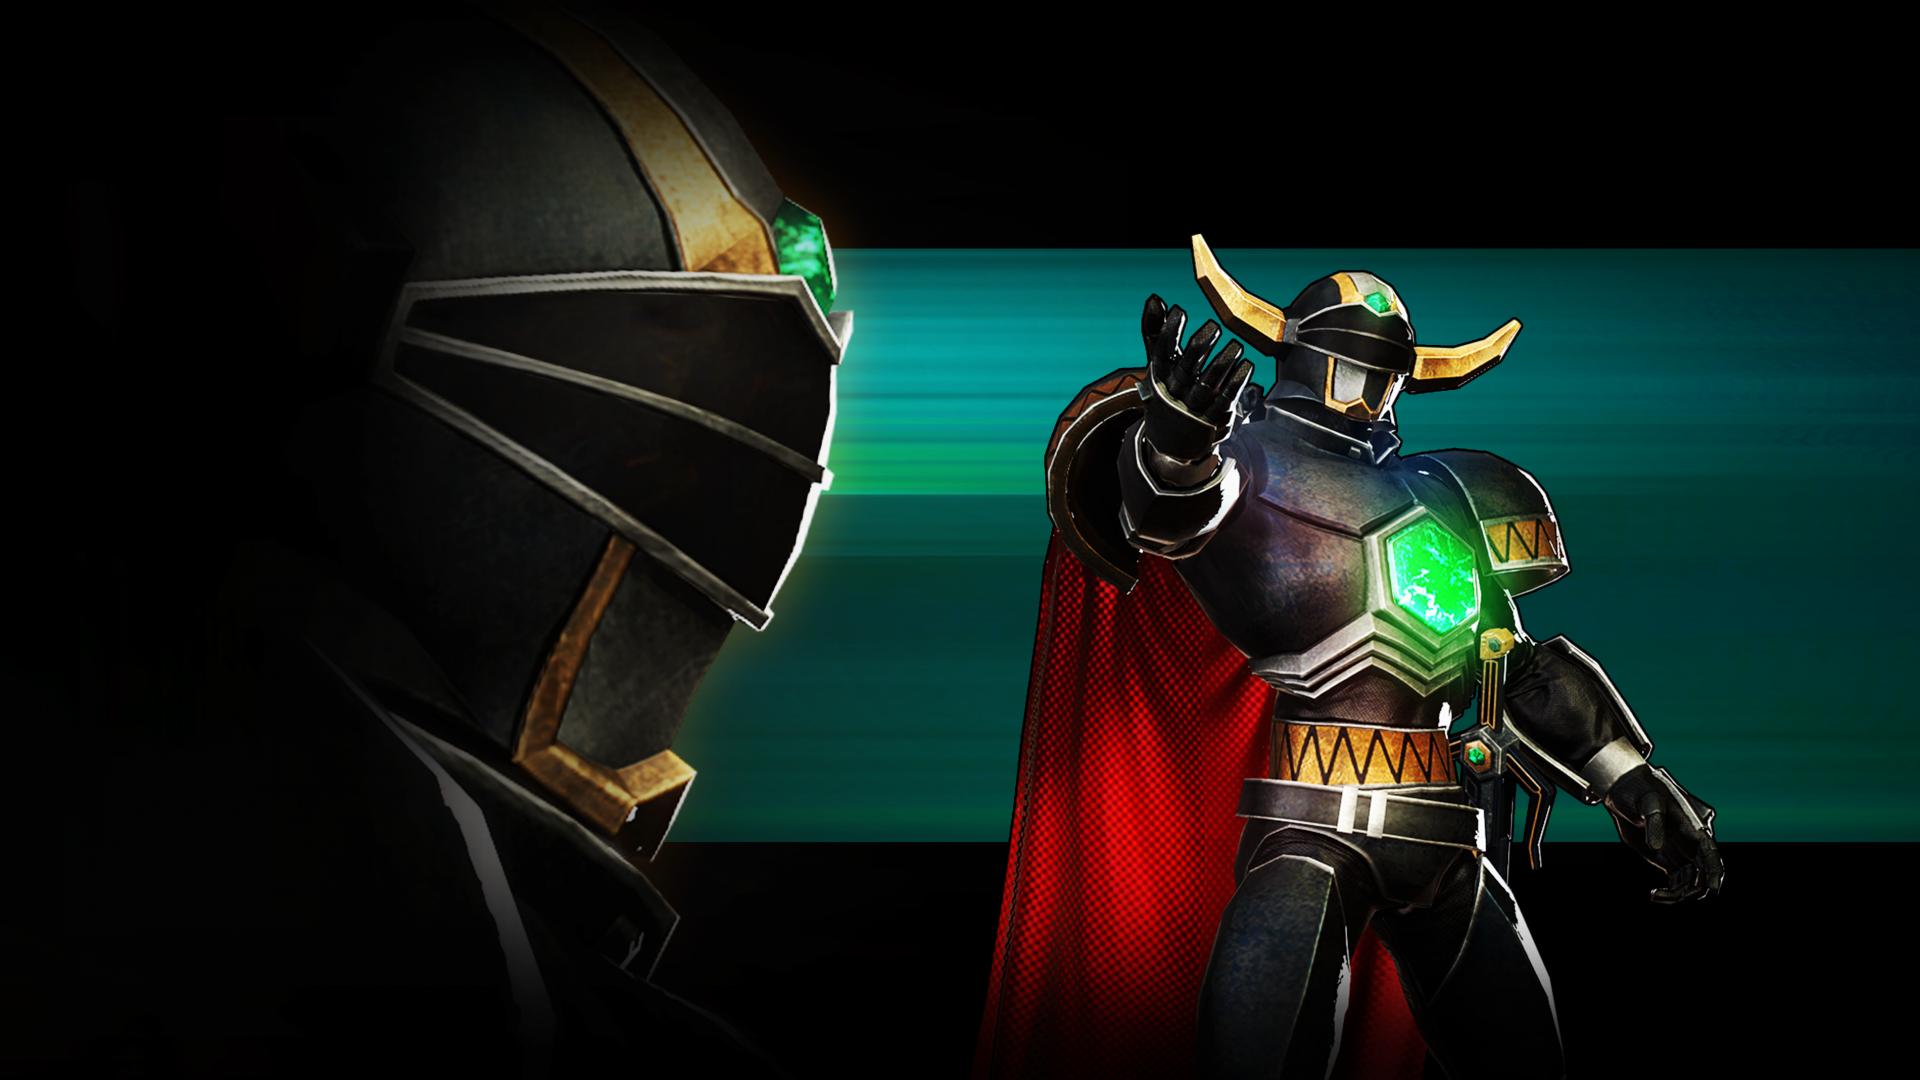 Power rangers lost galaxy magna defender sword